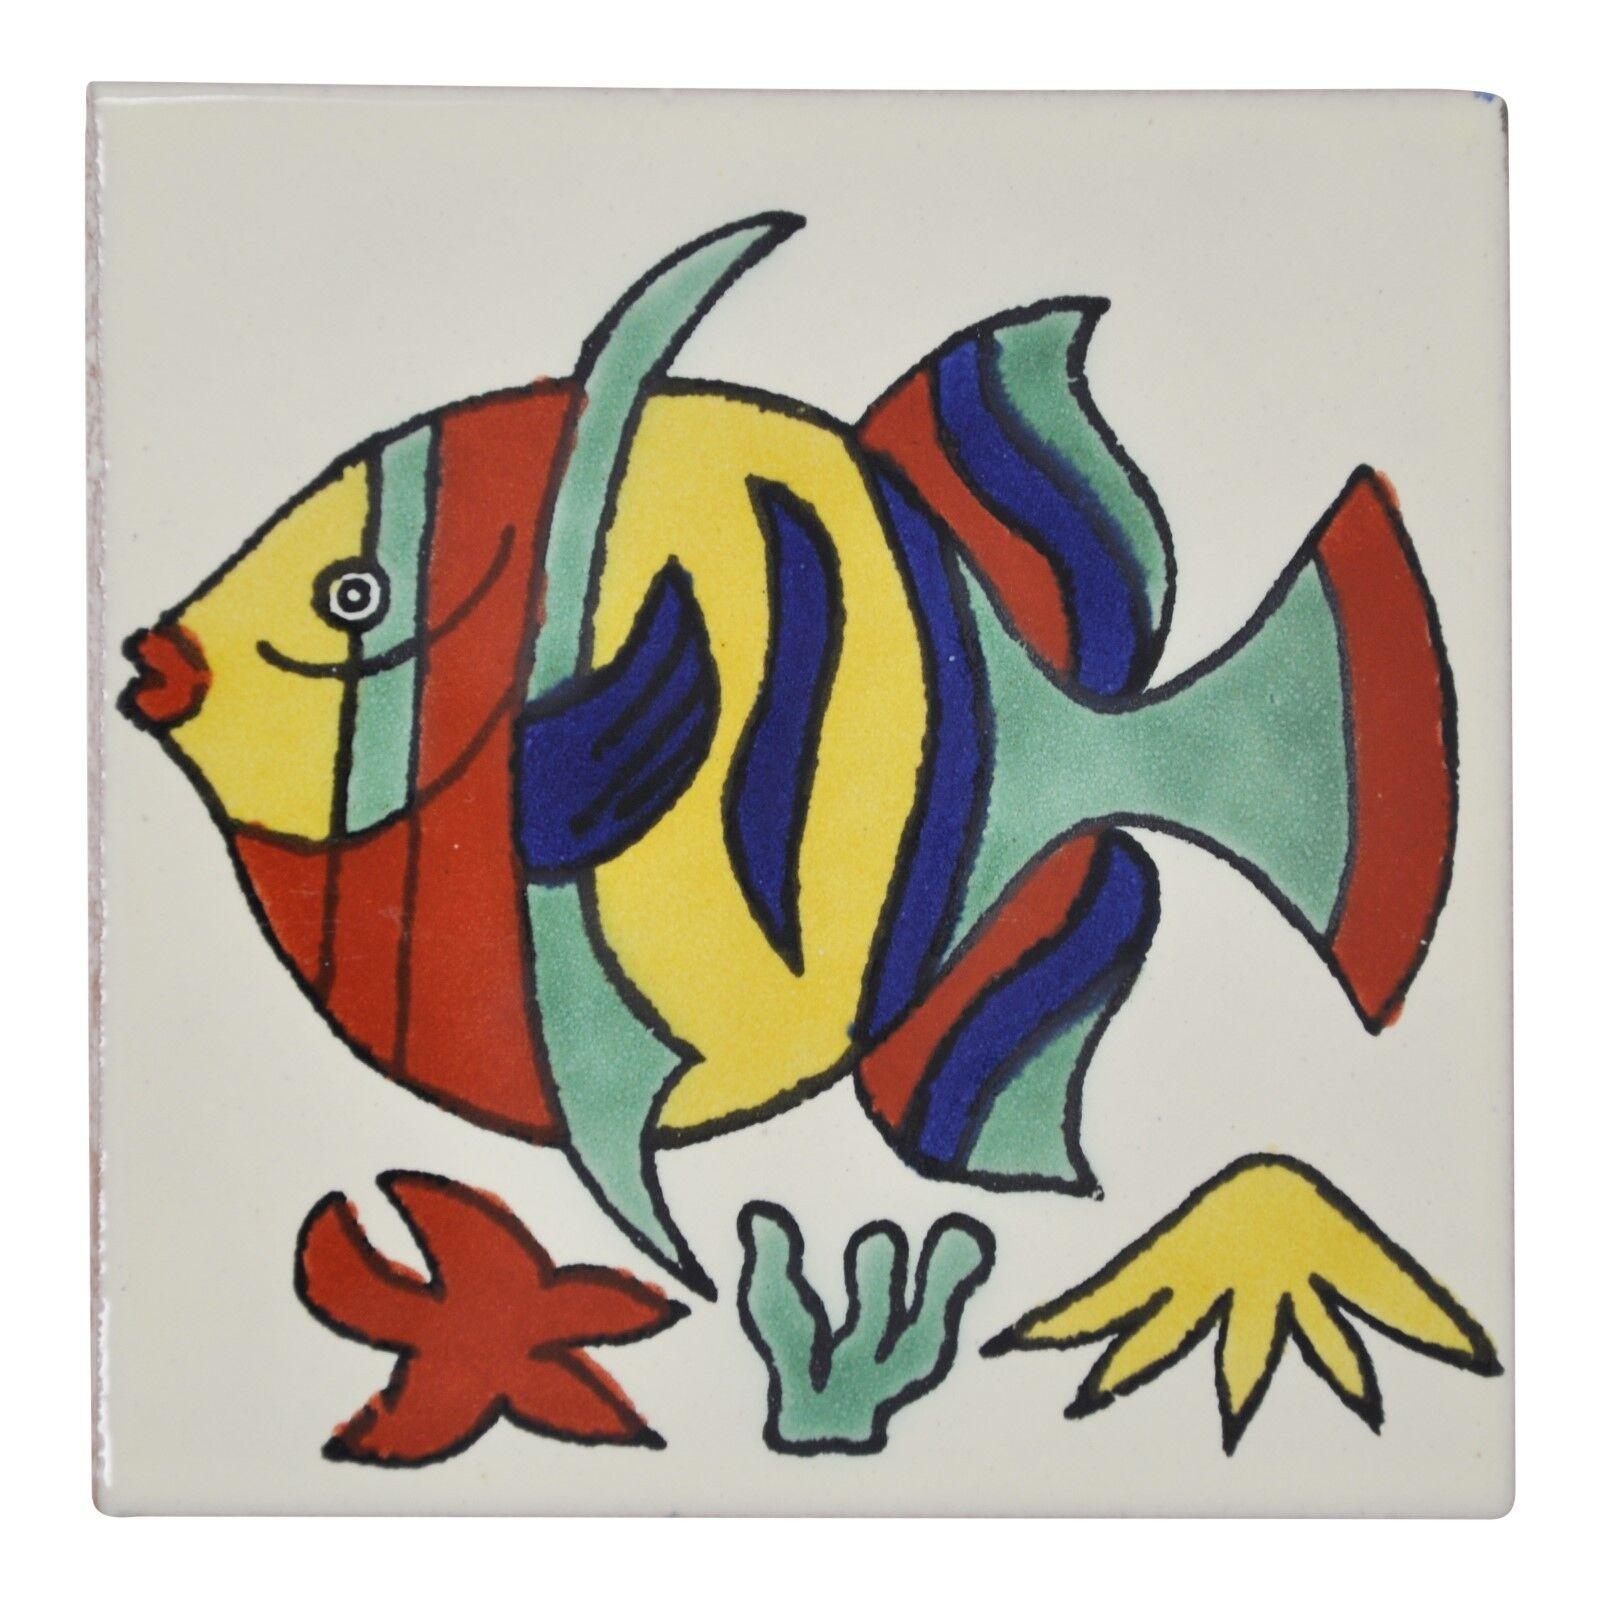 Fairly Traded Handmade Ceramic Mexican Talavera Tile 10.5cm - Edmundo